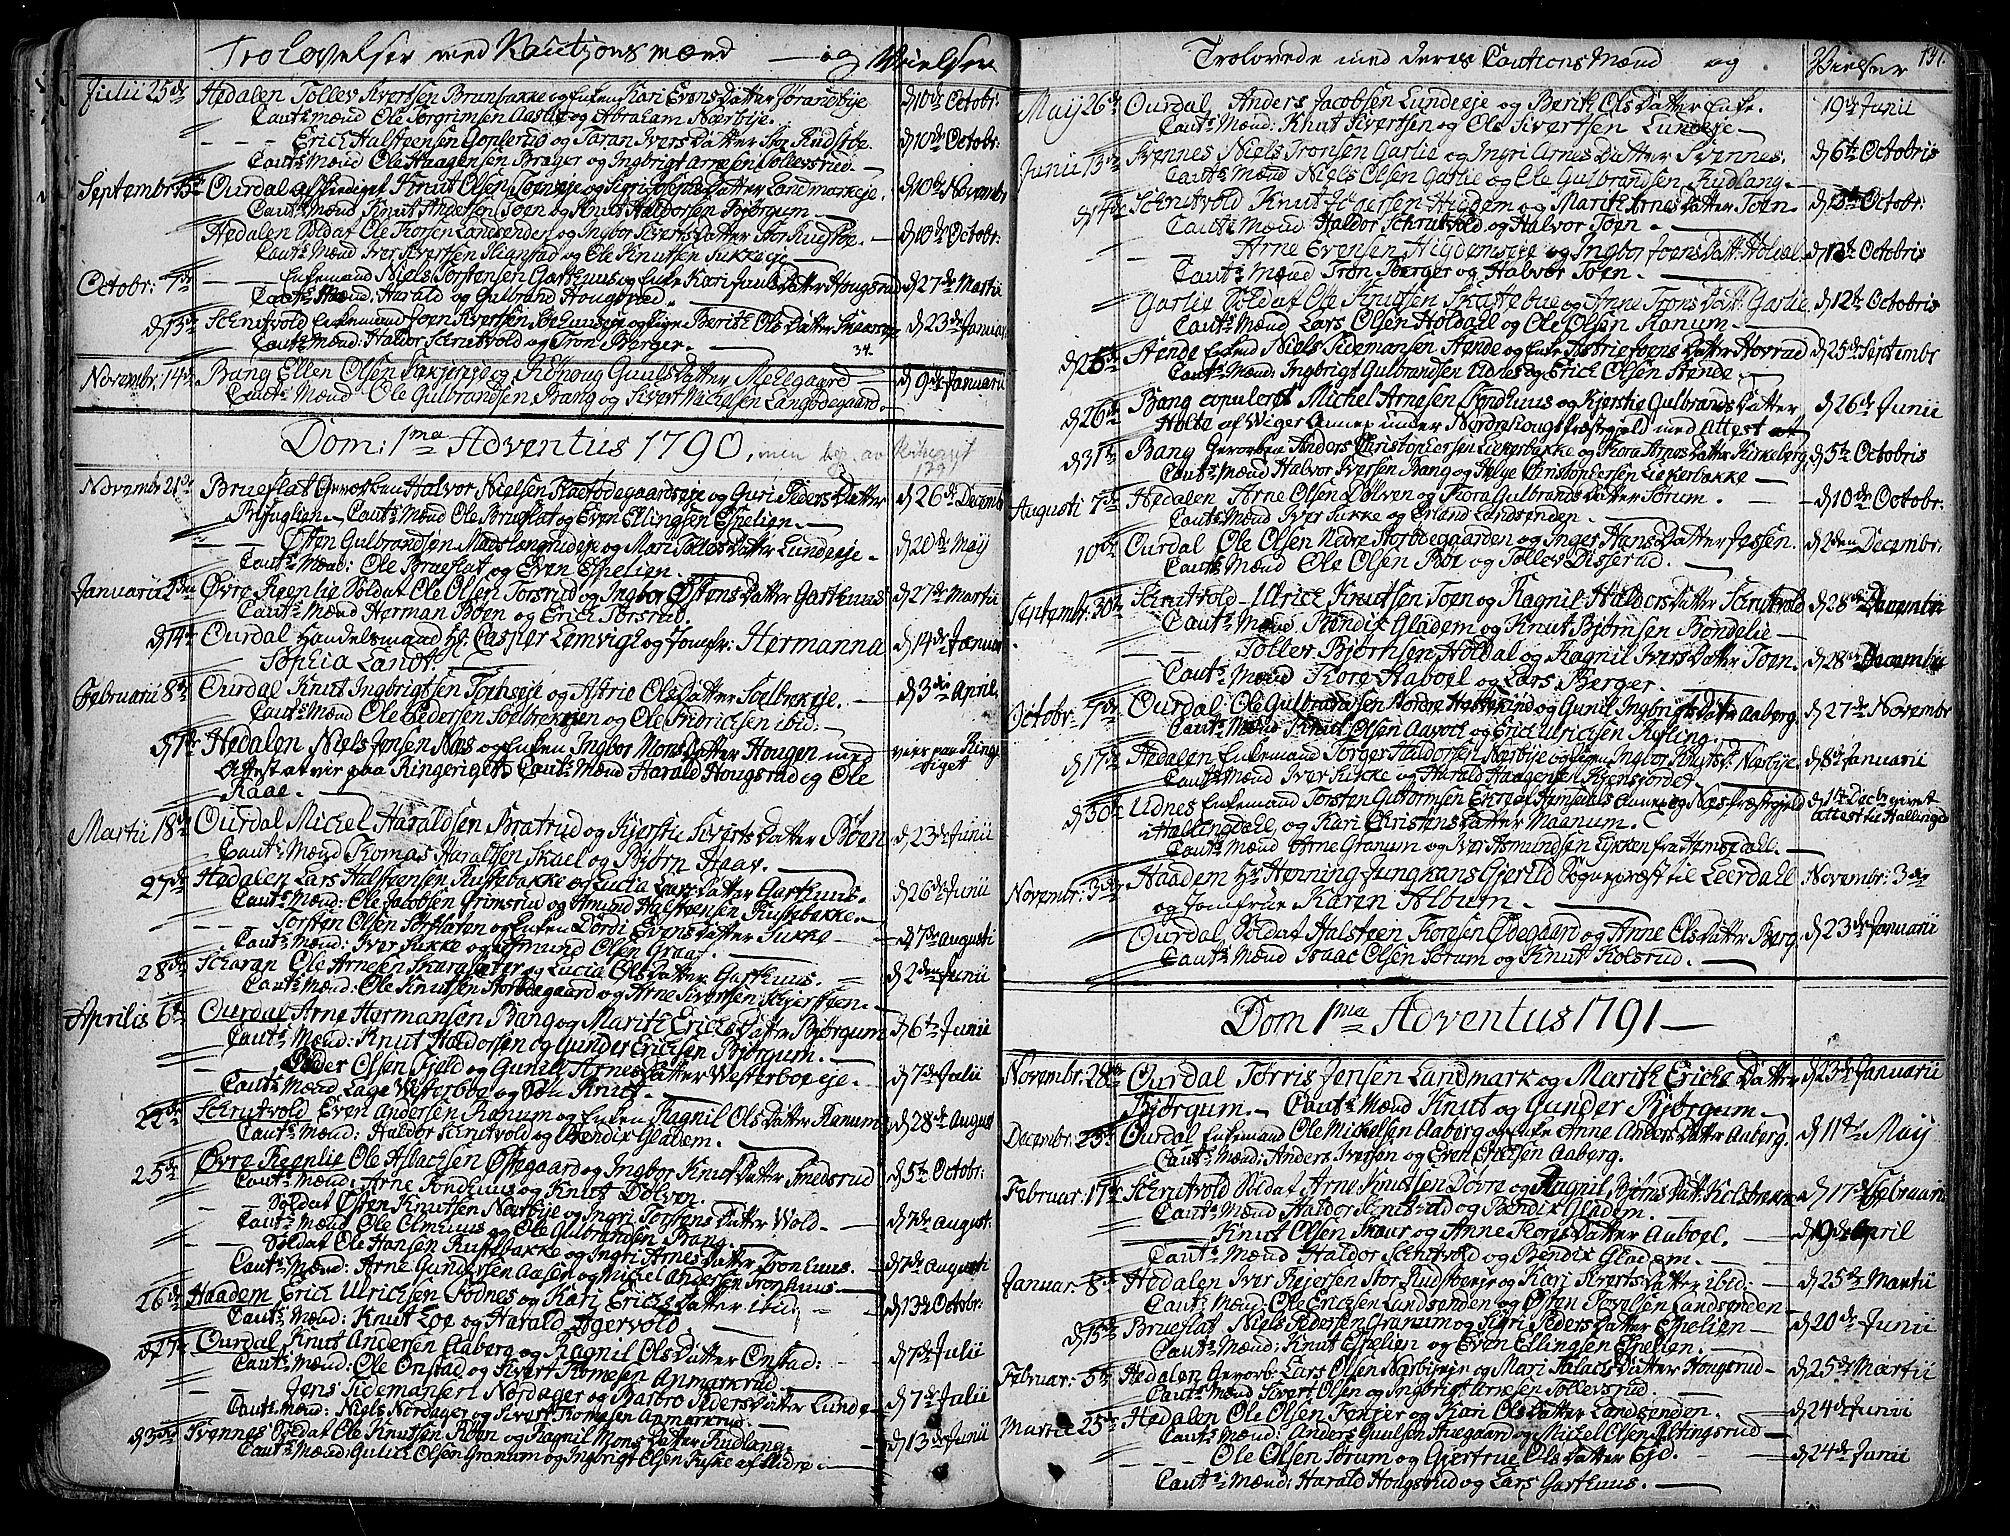 SAH, Aurdal prestekontor, Ministerialbok nr. 6, 1781-1804, s. 137